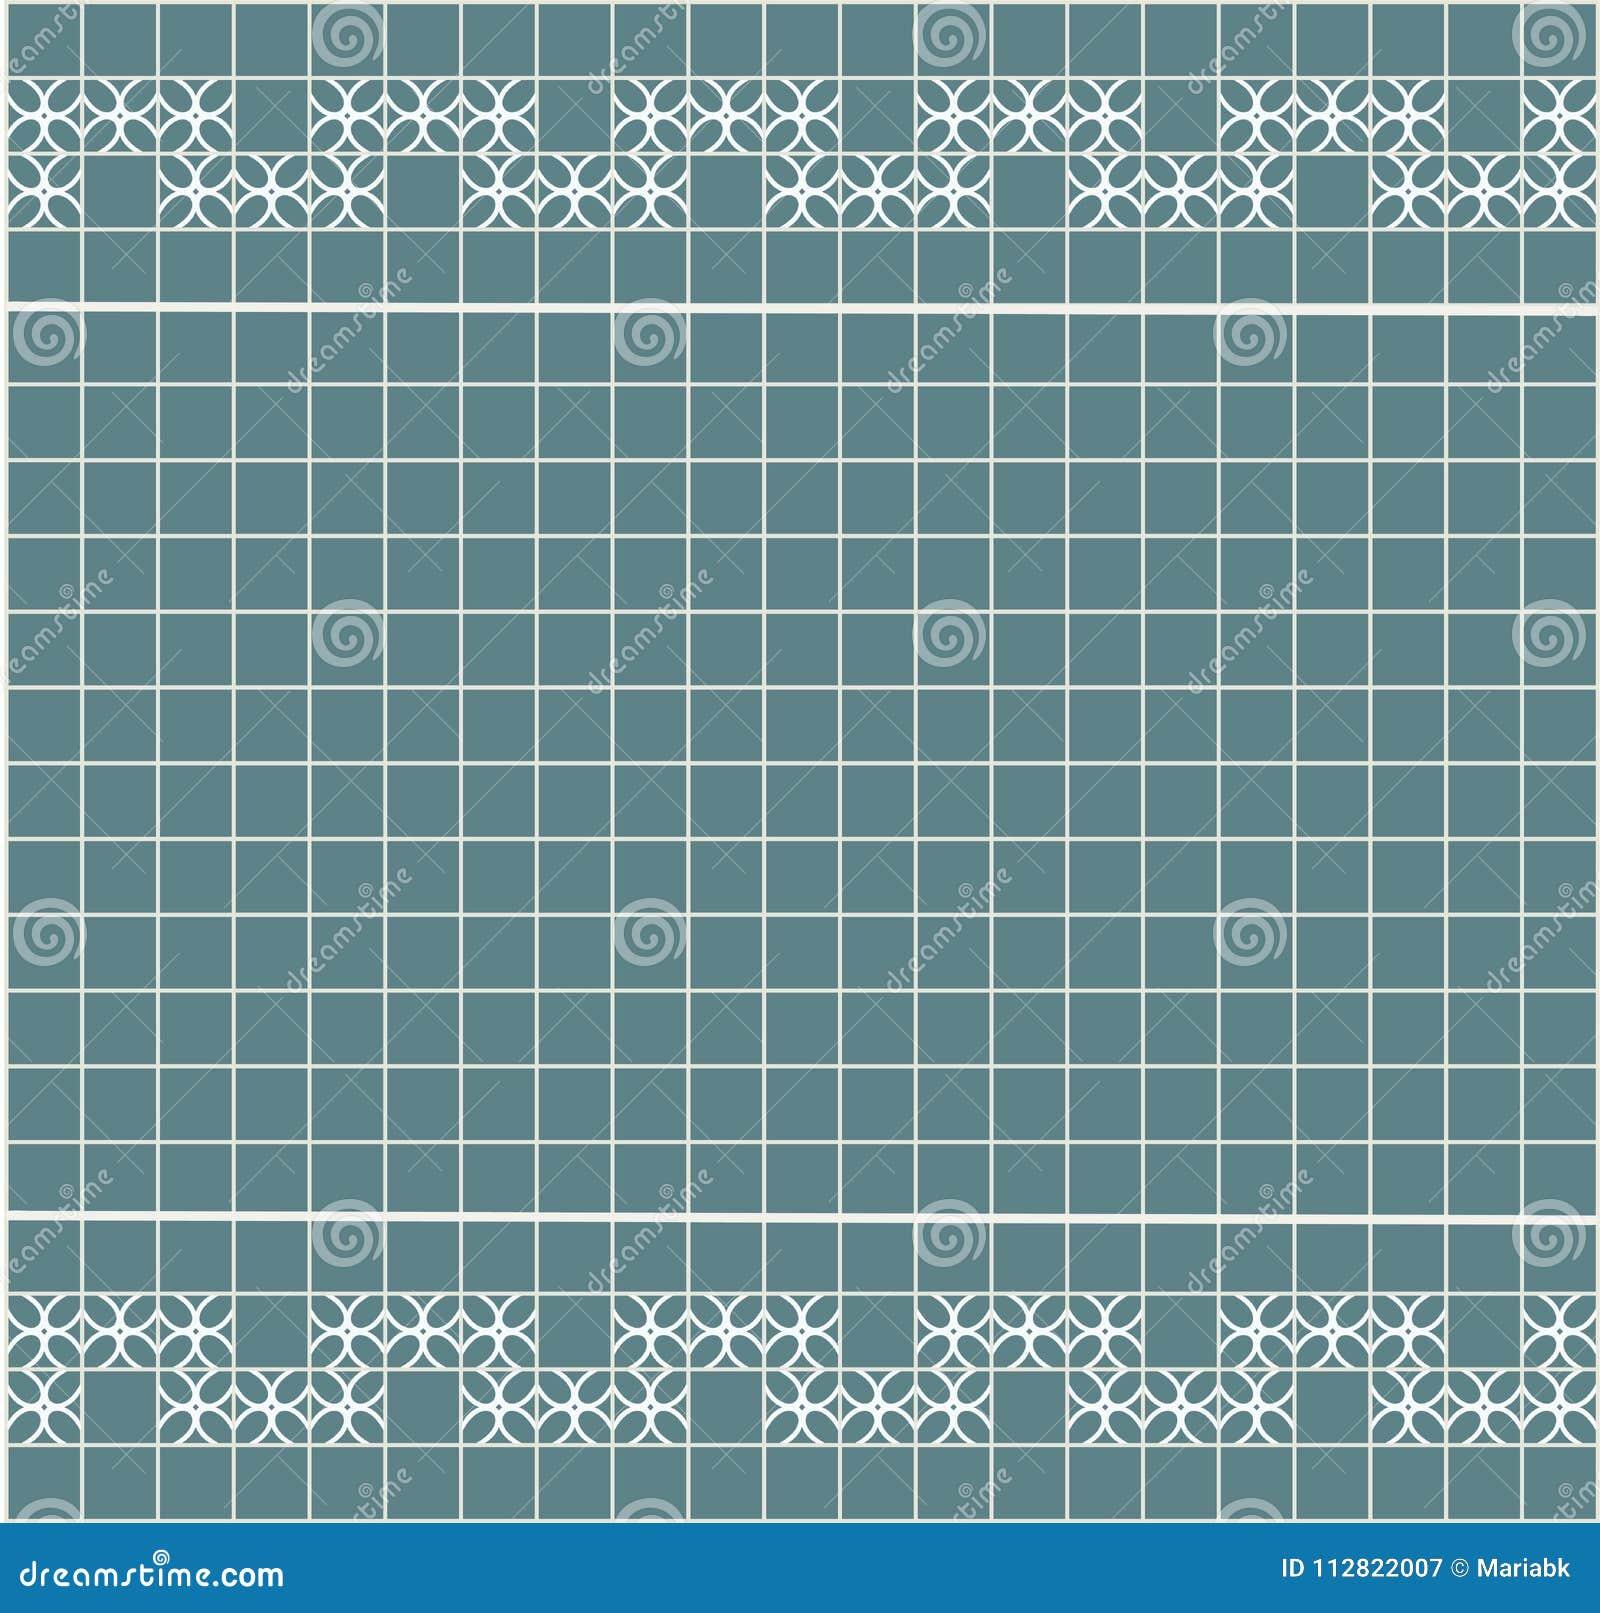 Tile Decoration. Steal Teal Square Tiles With Decor. Interior Design ...